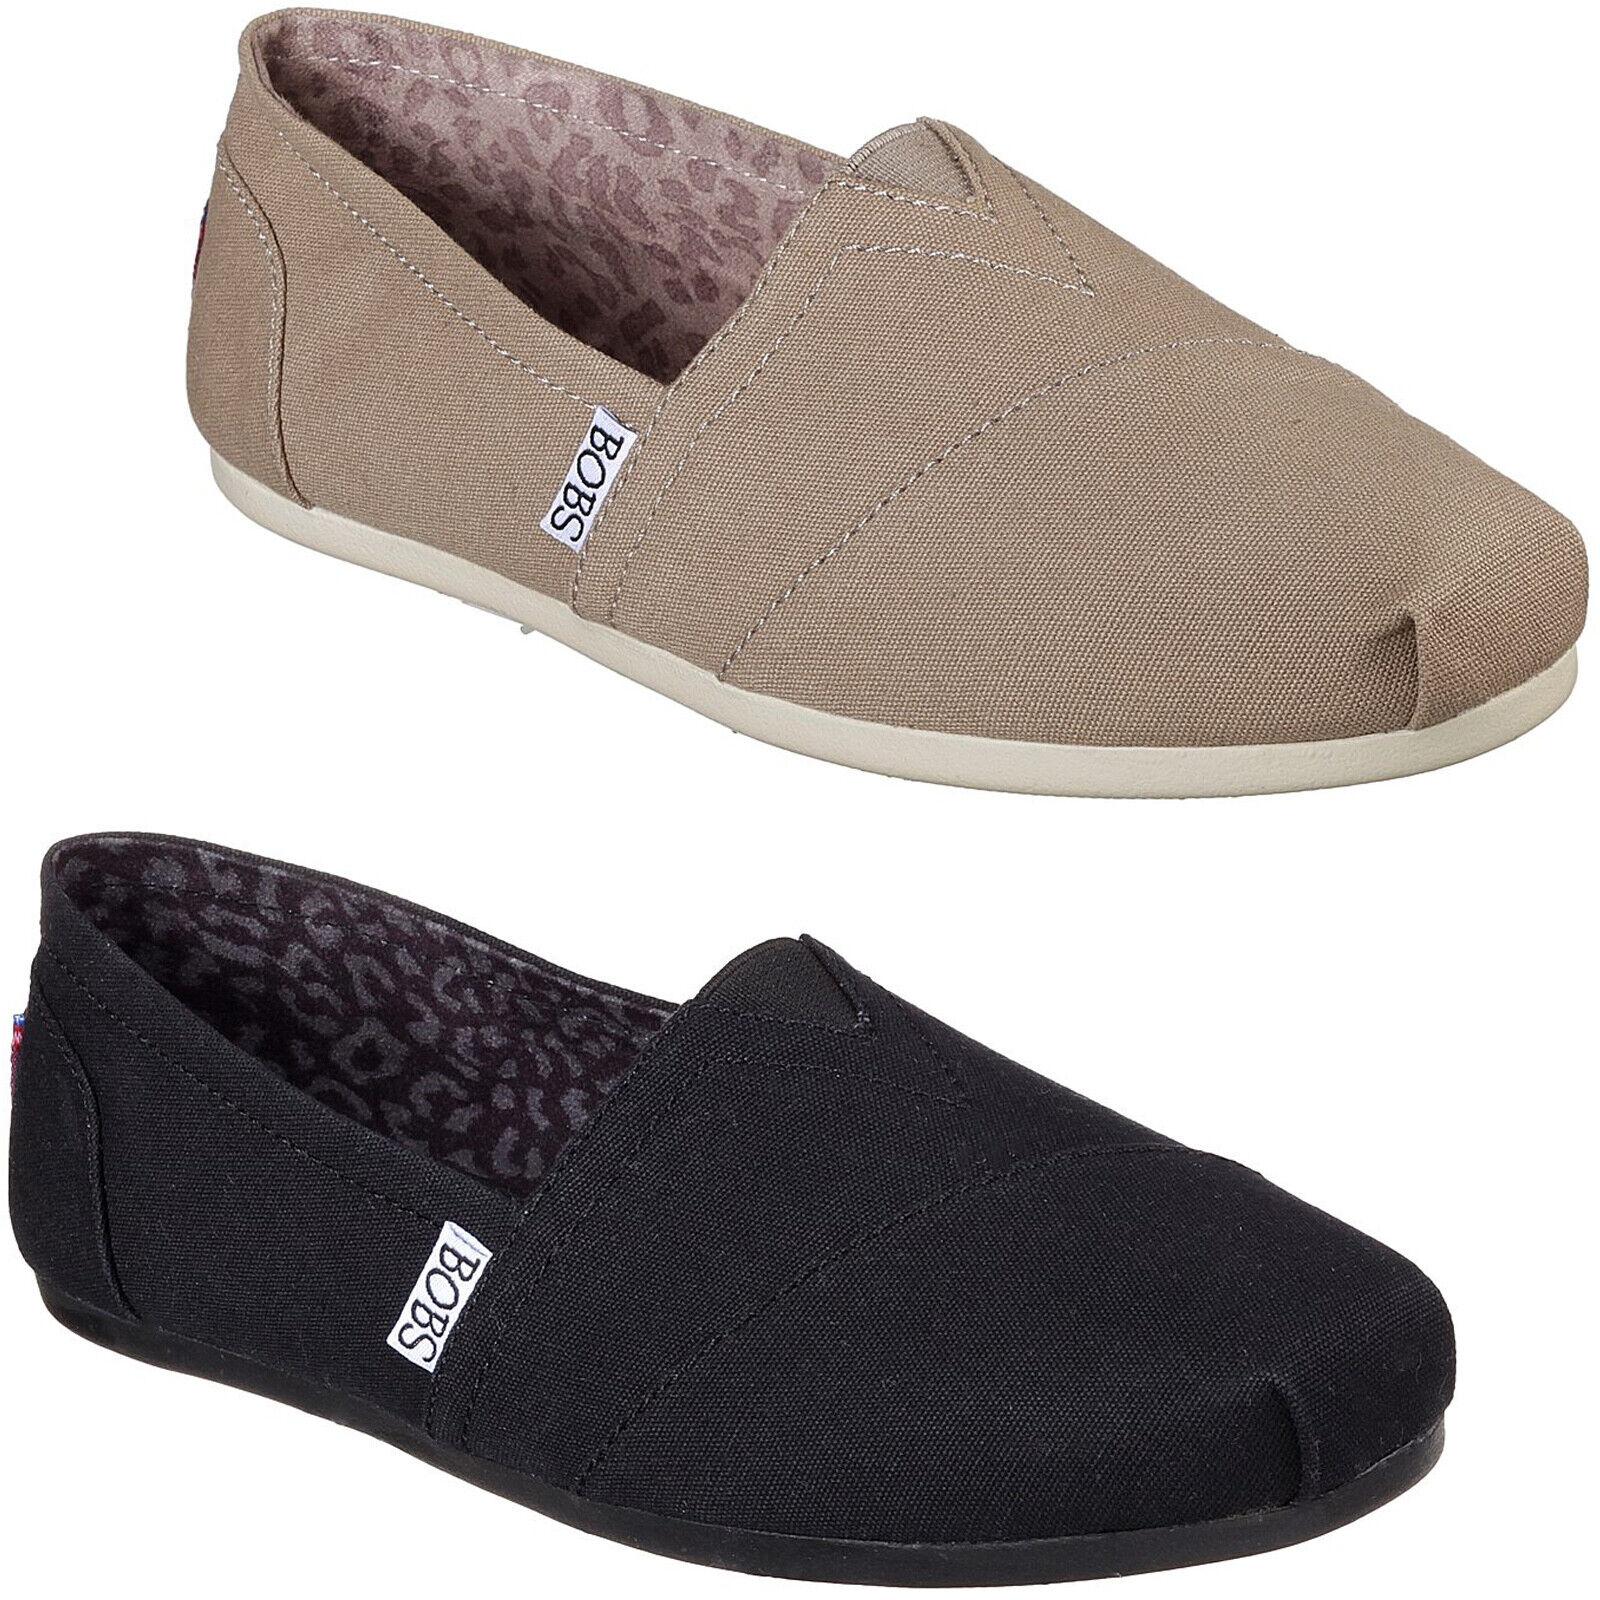 Chaussures à enfiler pour femmes, BOBS Plush Peace and Love